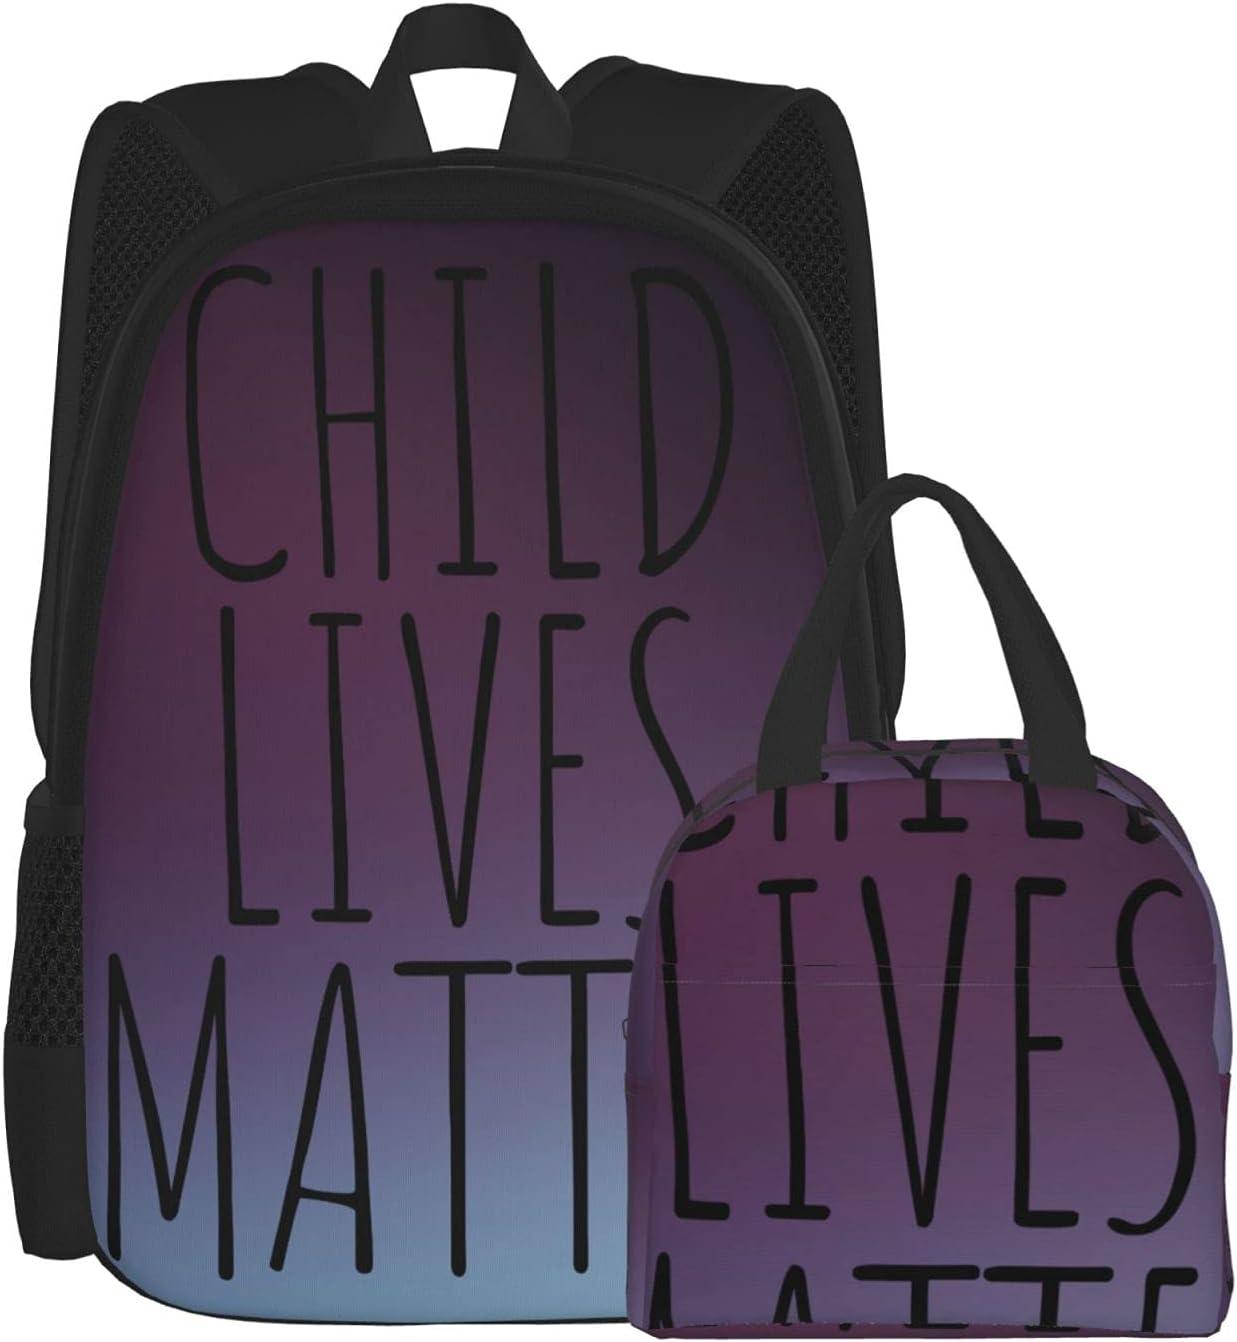 OYQGEJGPJA 2-Piece Set Child Lives Detroit Mall Schoolbag Backpack 2 Deluxe Matter